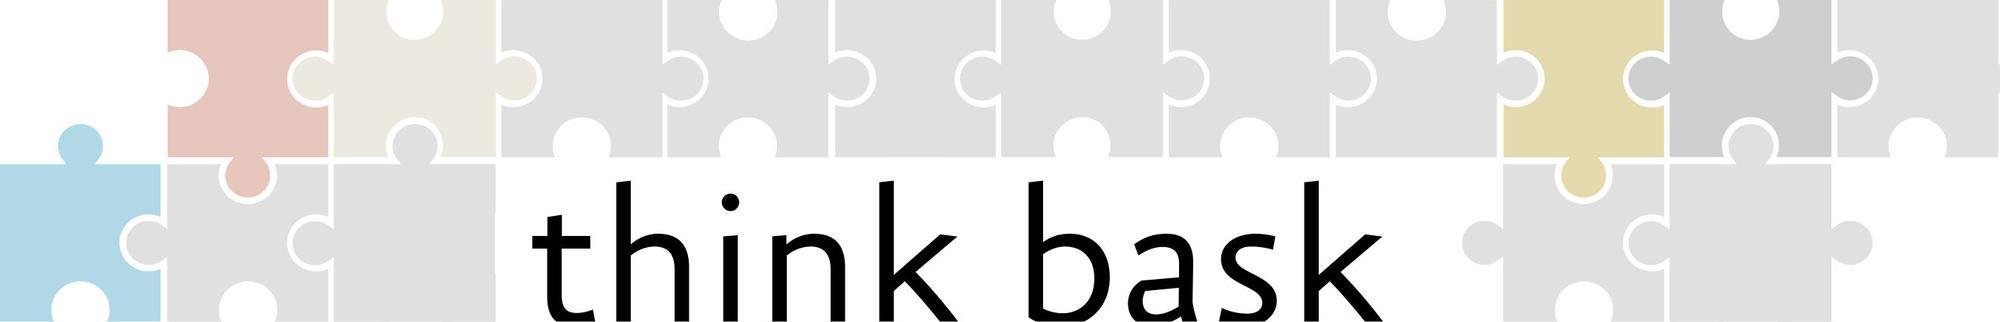 Think Bask